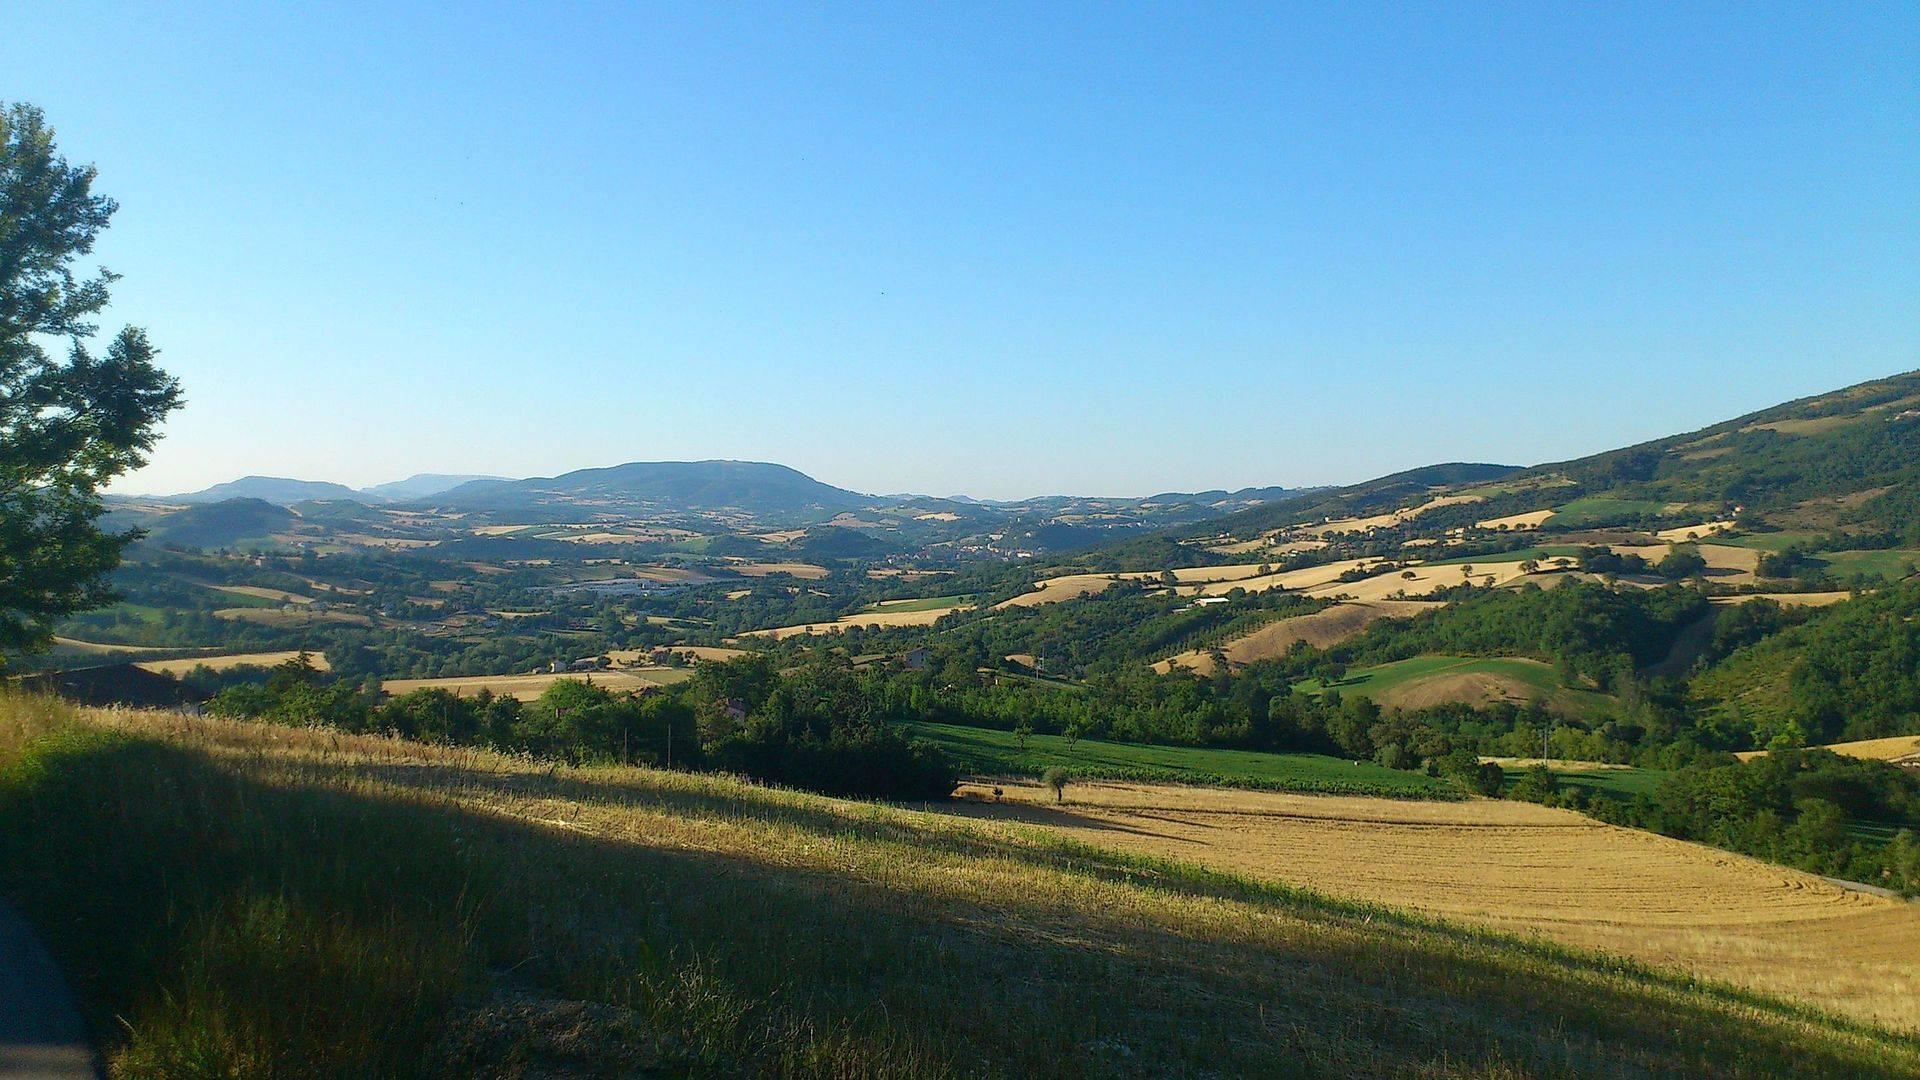 Região de Mache, na Itália. Foto: Wikimedia Commons